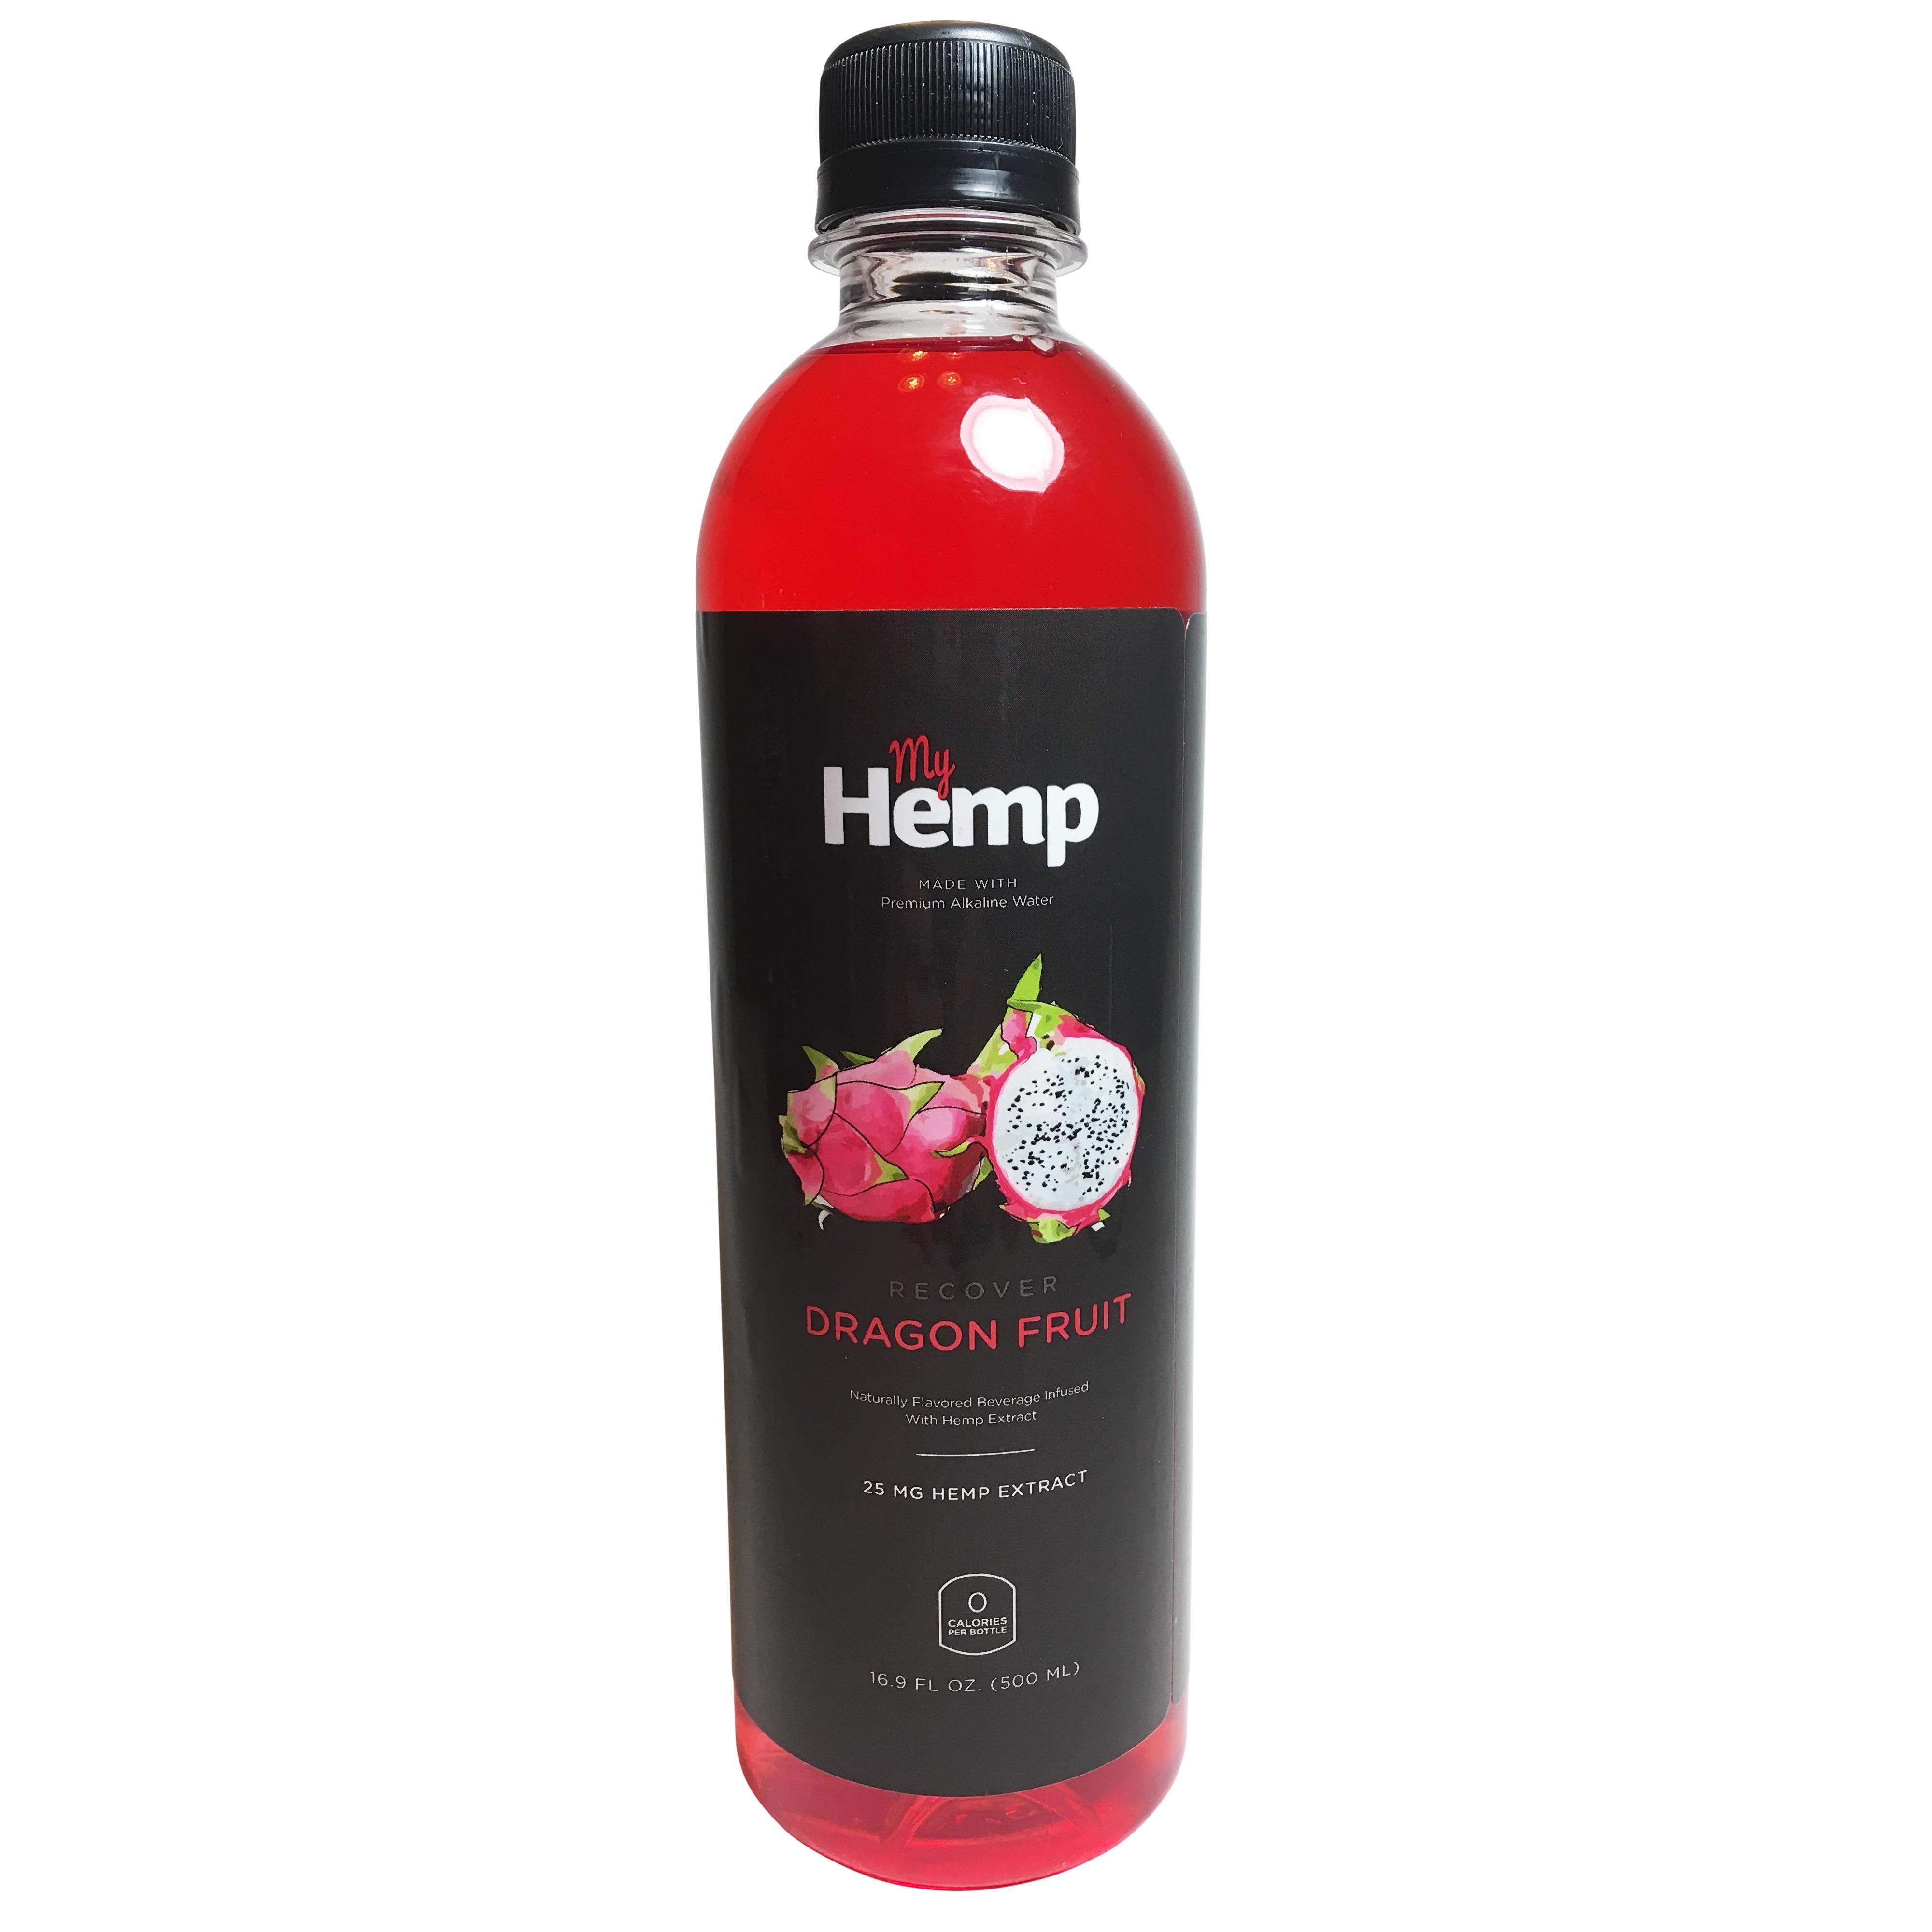 Dragon Fruit CBD-Infused Hemp Tea Drink Wholesale